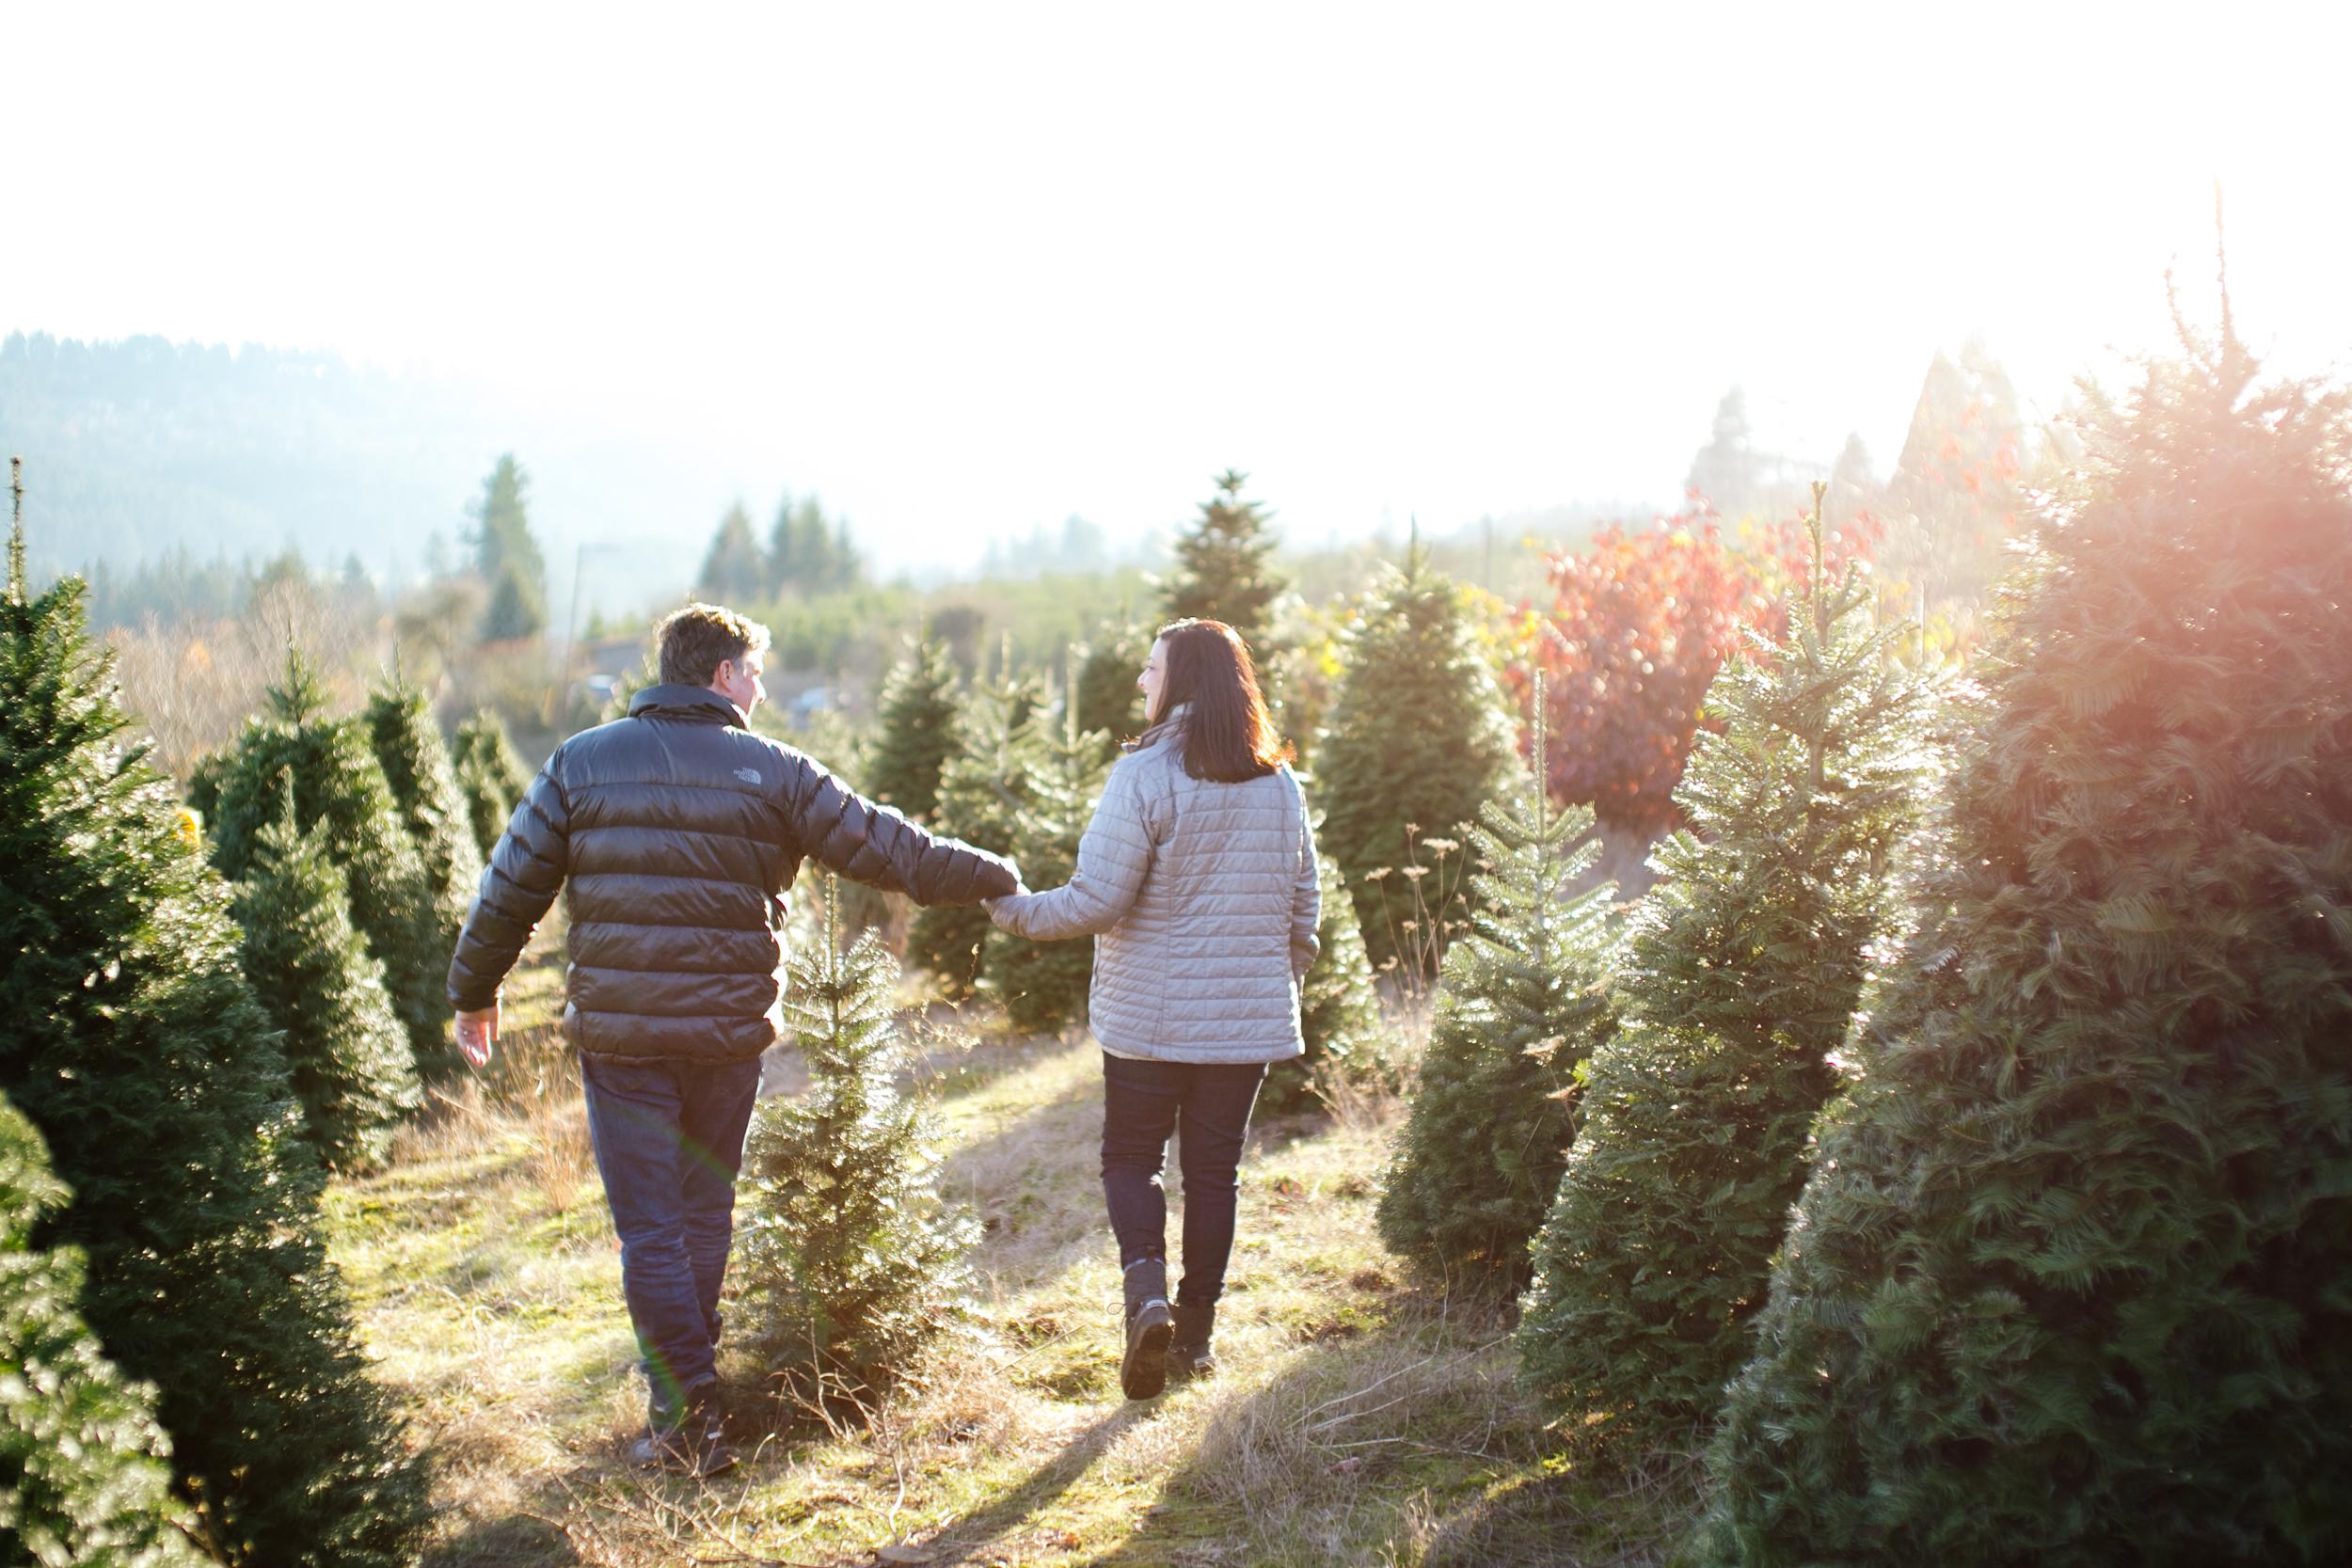 sleighbells-of-sherwood-family-photos-10.jpg